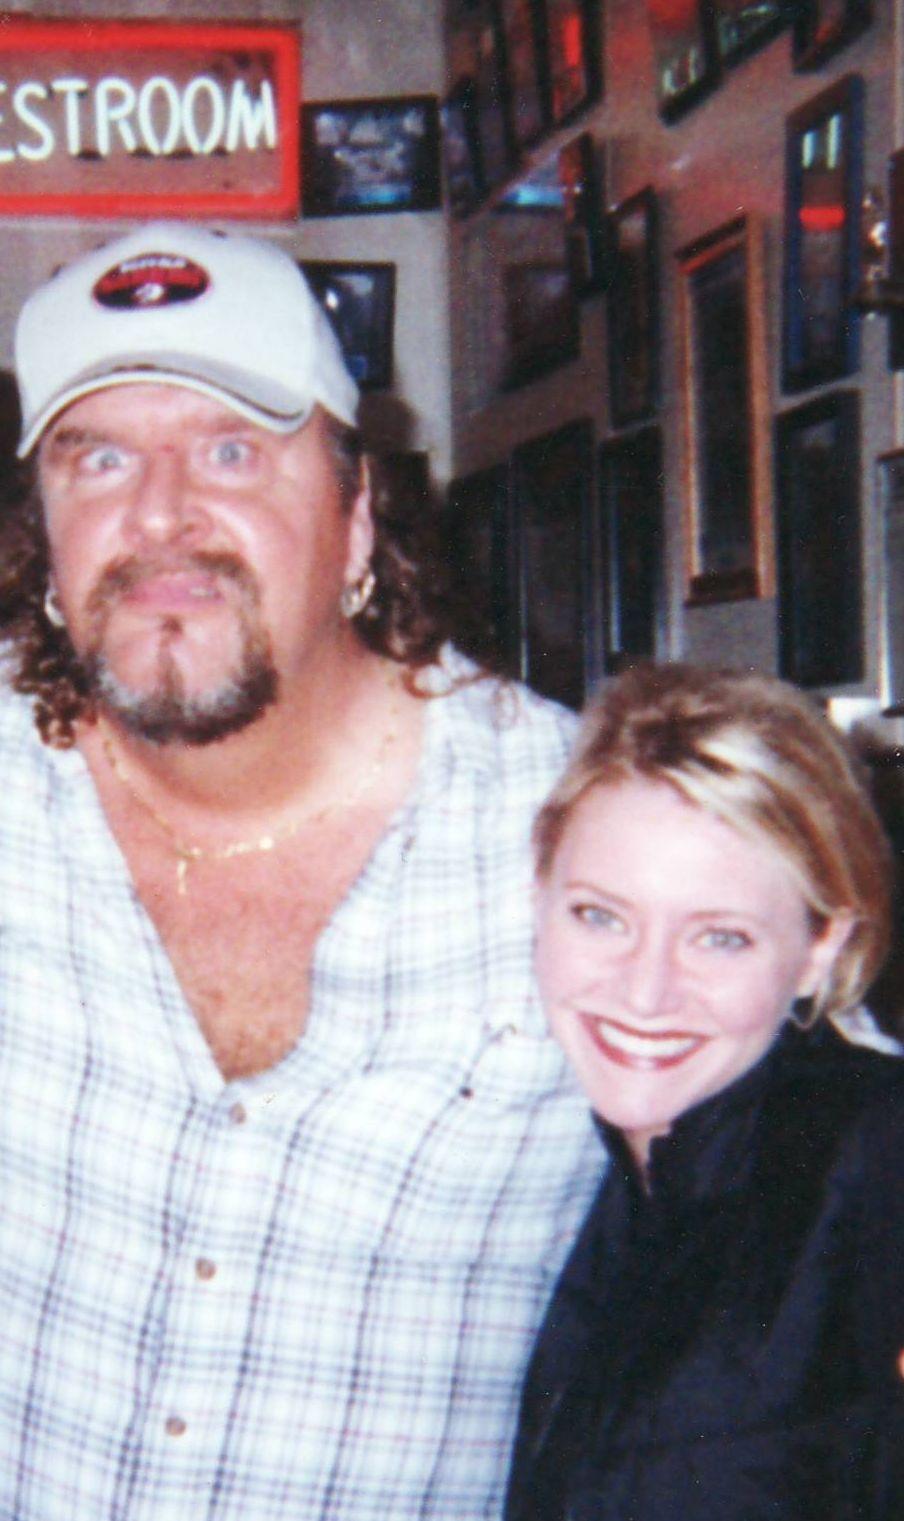 Carey with Ogar - Actor Donald Gibb fom Revenge of the Nerds